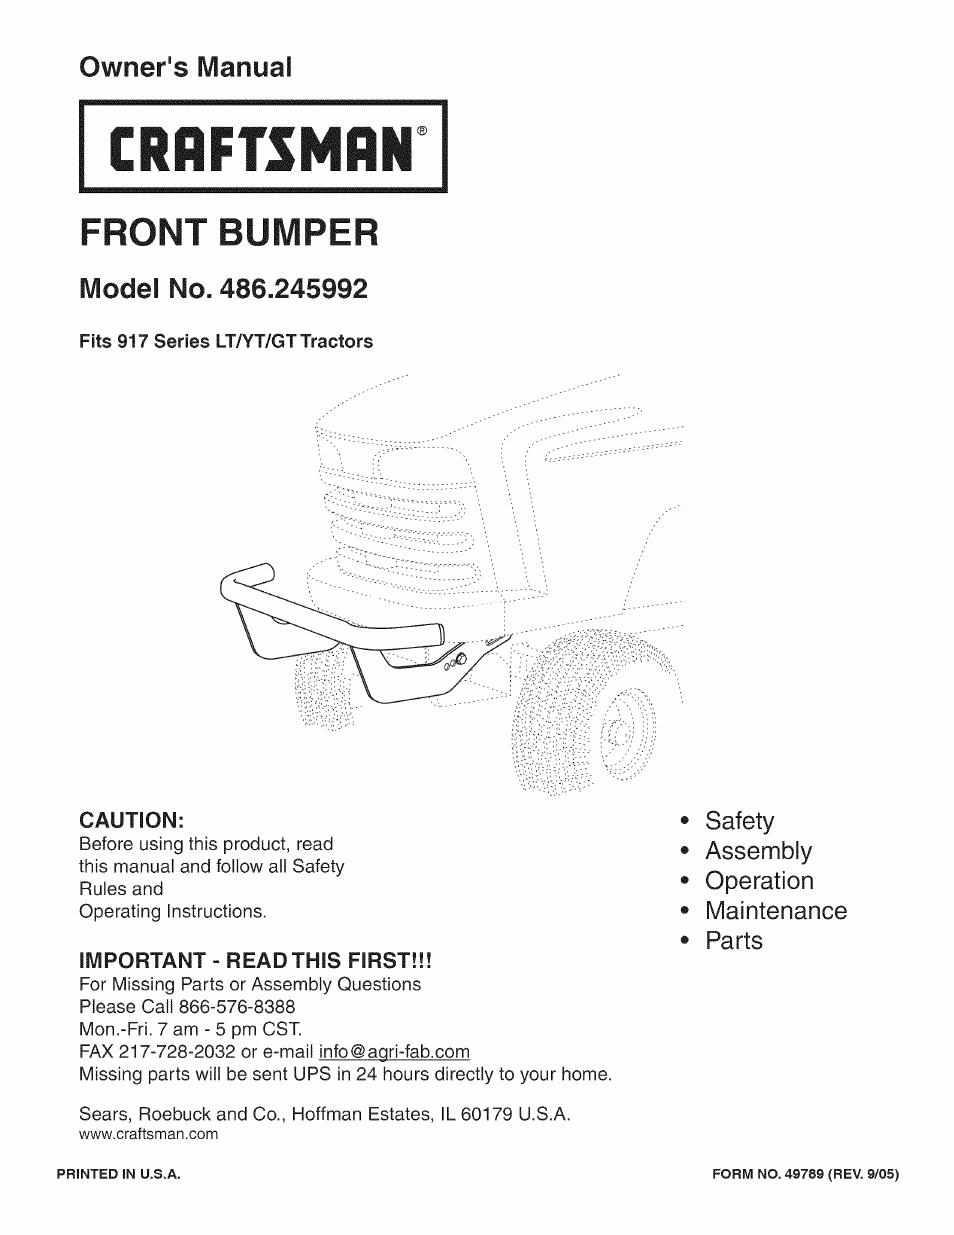 craftsman 486 245992 user manual 8 pages rh manualsdir com Craftsman Snowblower Manual Craftsman Snow Blower Manuals 24788190 0